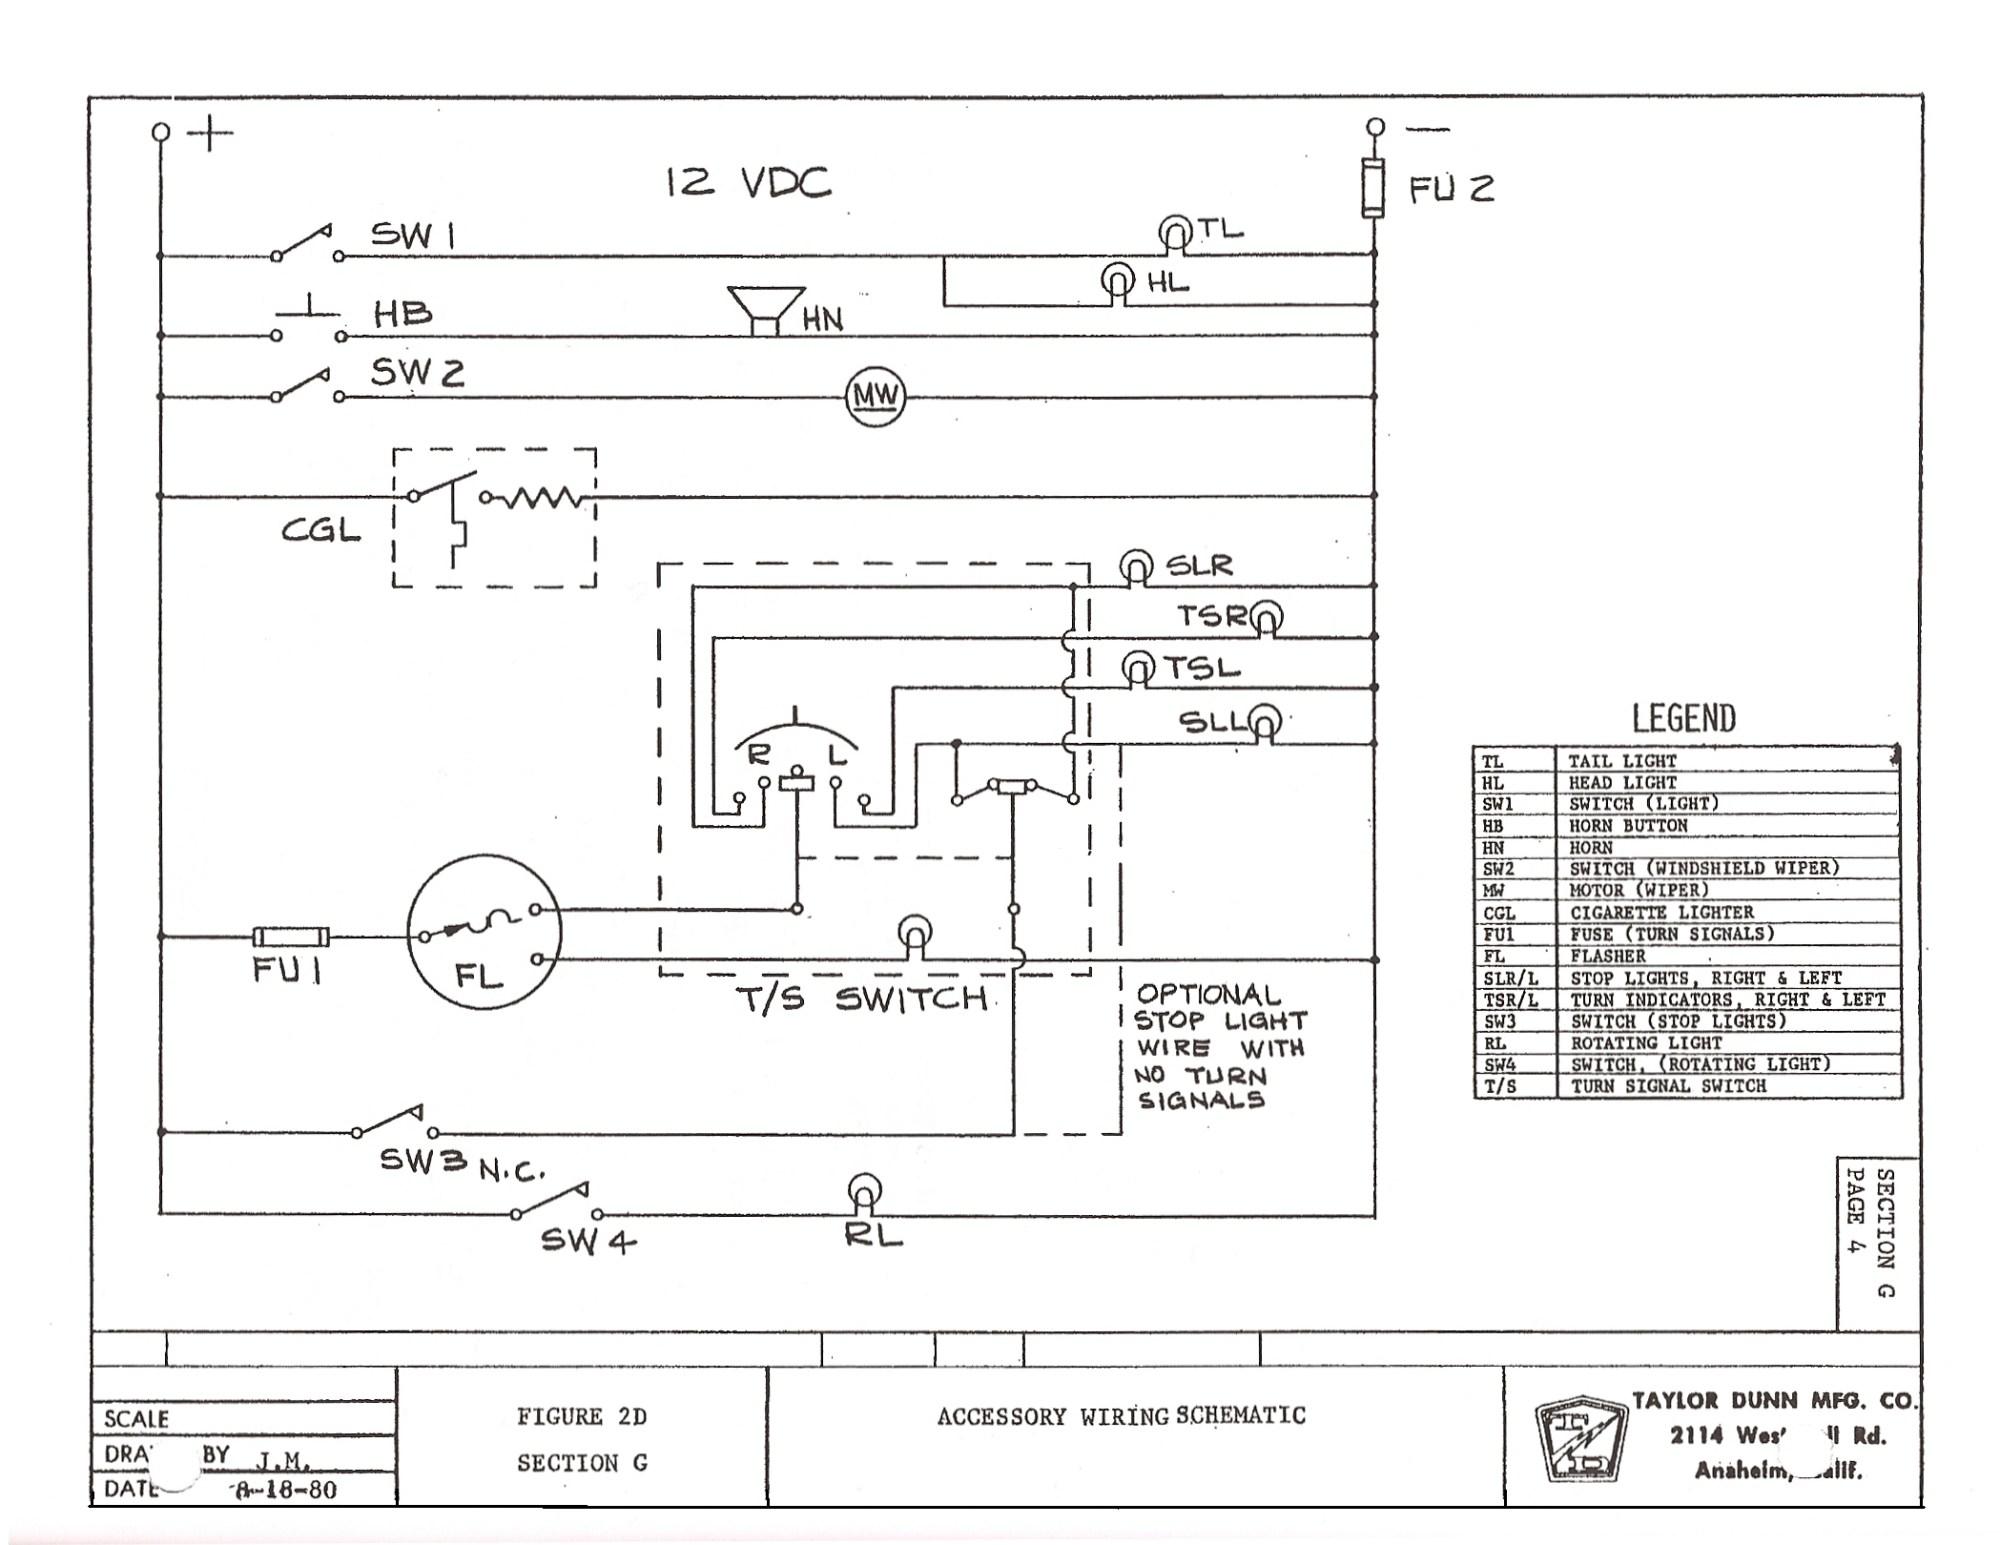 hight resolution of taylor dunn battery wiring diagram wiring diagram third level rh 19 14 16 jacobwinterstein com taylor dunn wiring diagram taylor dunn wiring diagram pdf